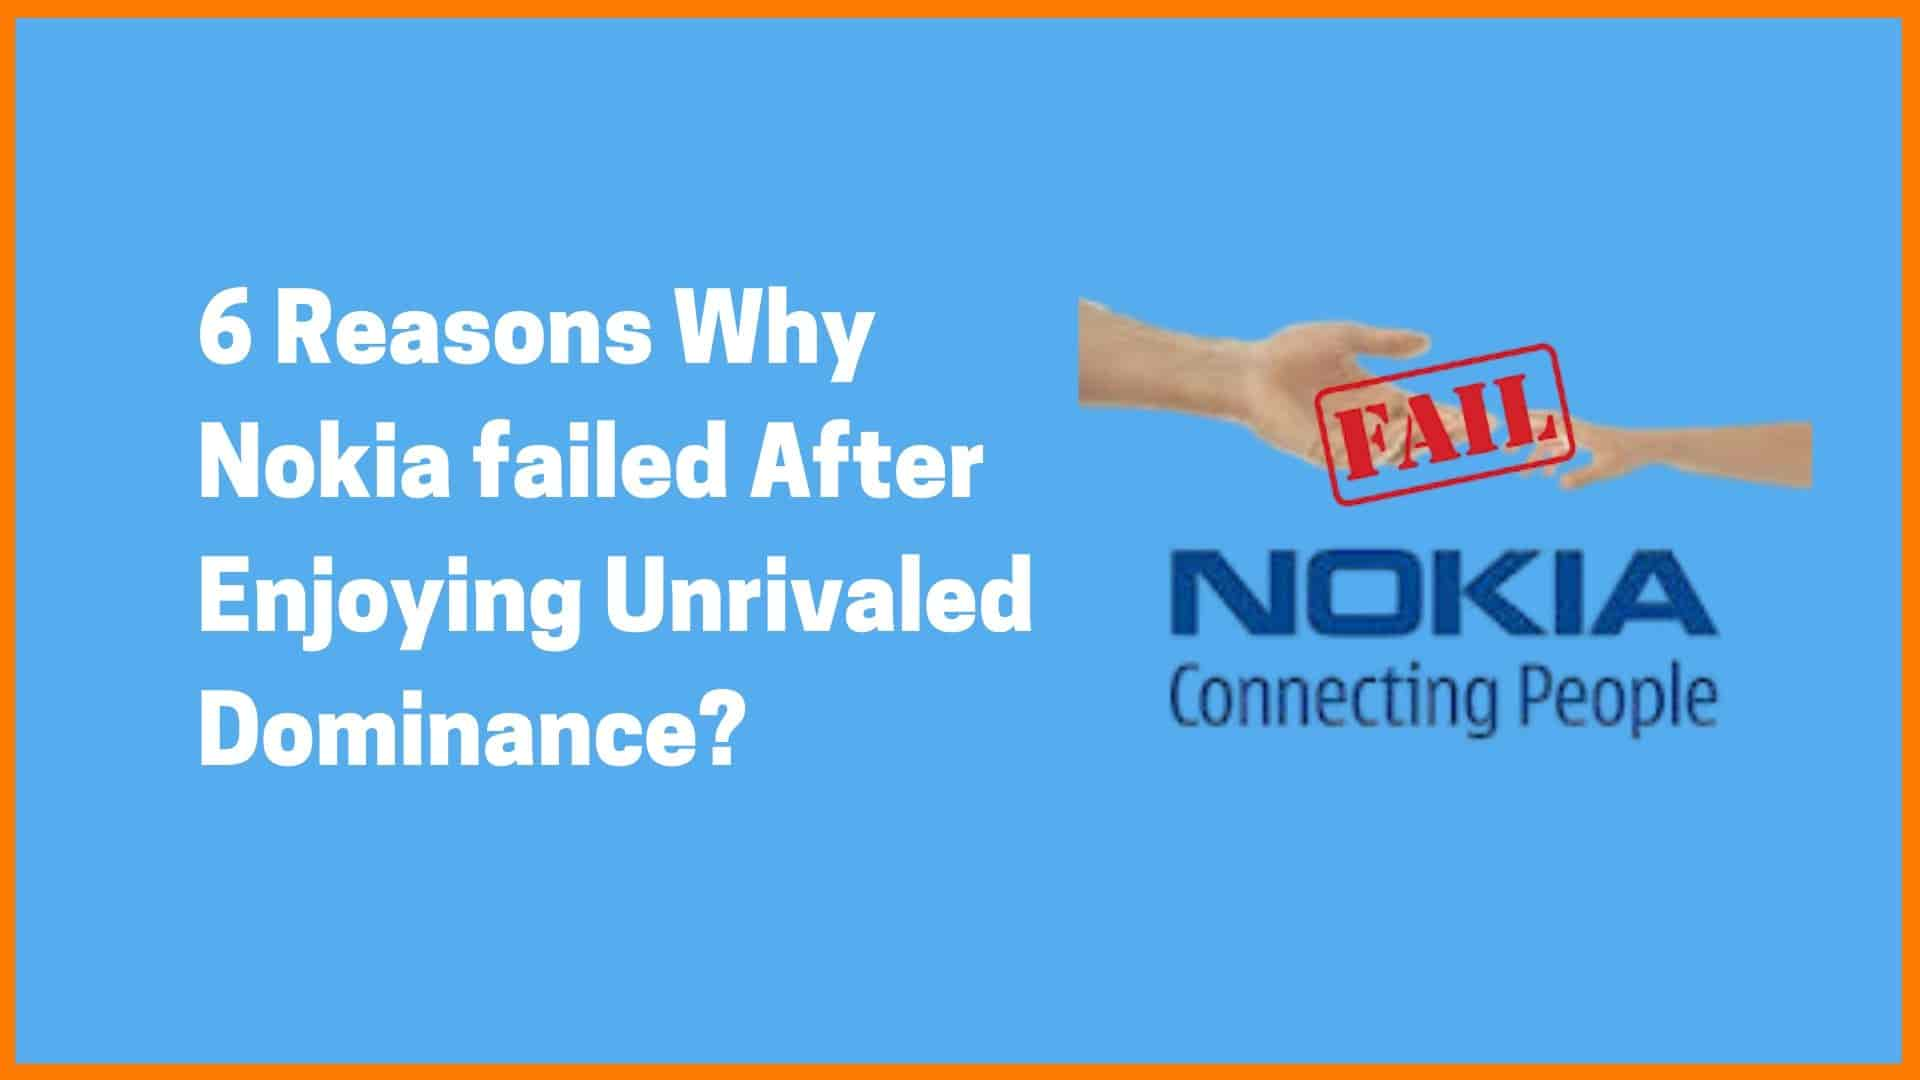 6 Reasons Why Nokia failed After Enjoying Unrivaled Dominance